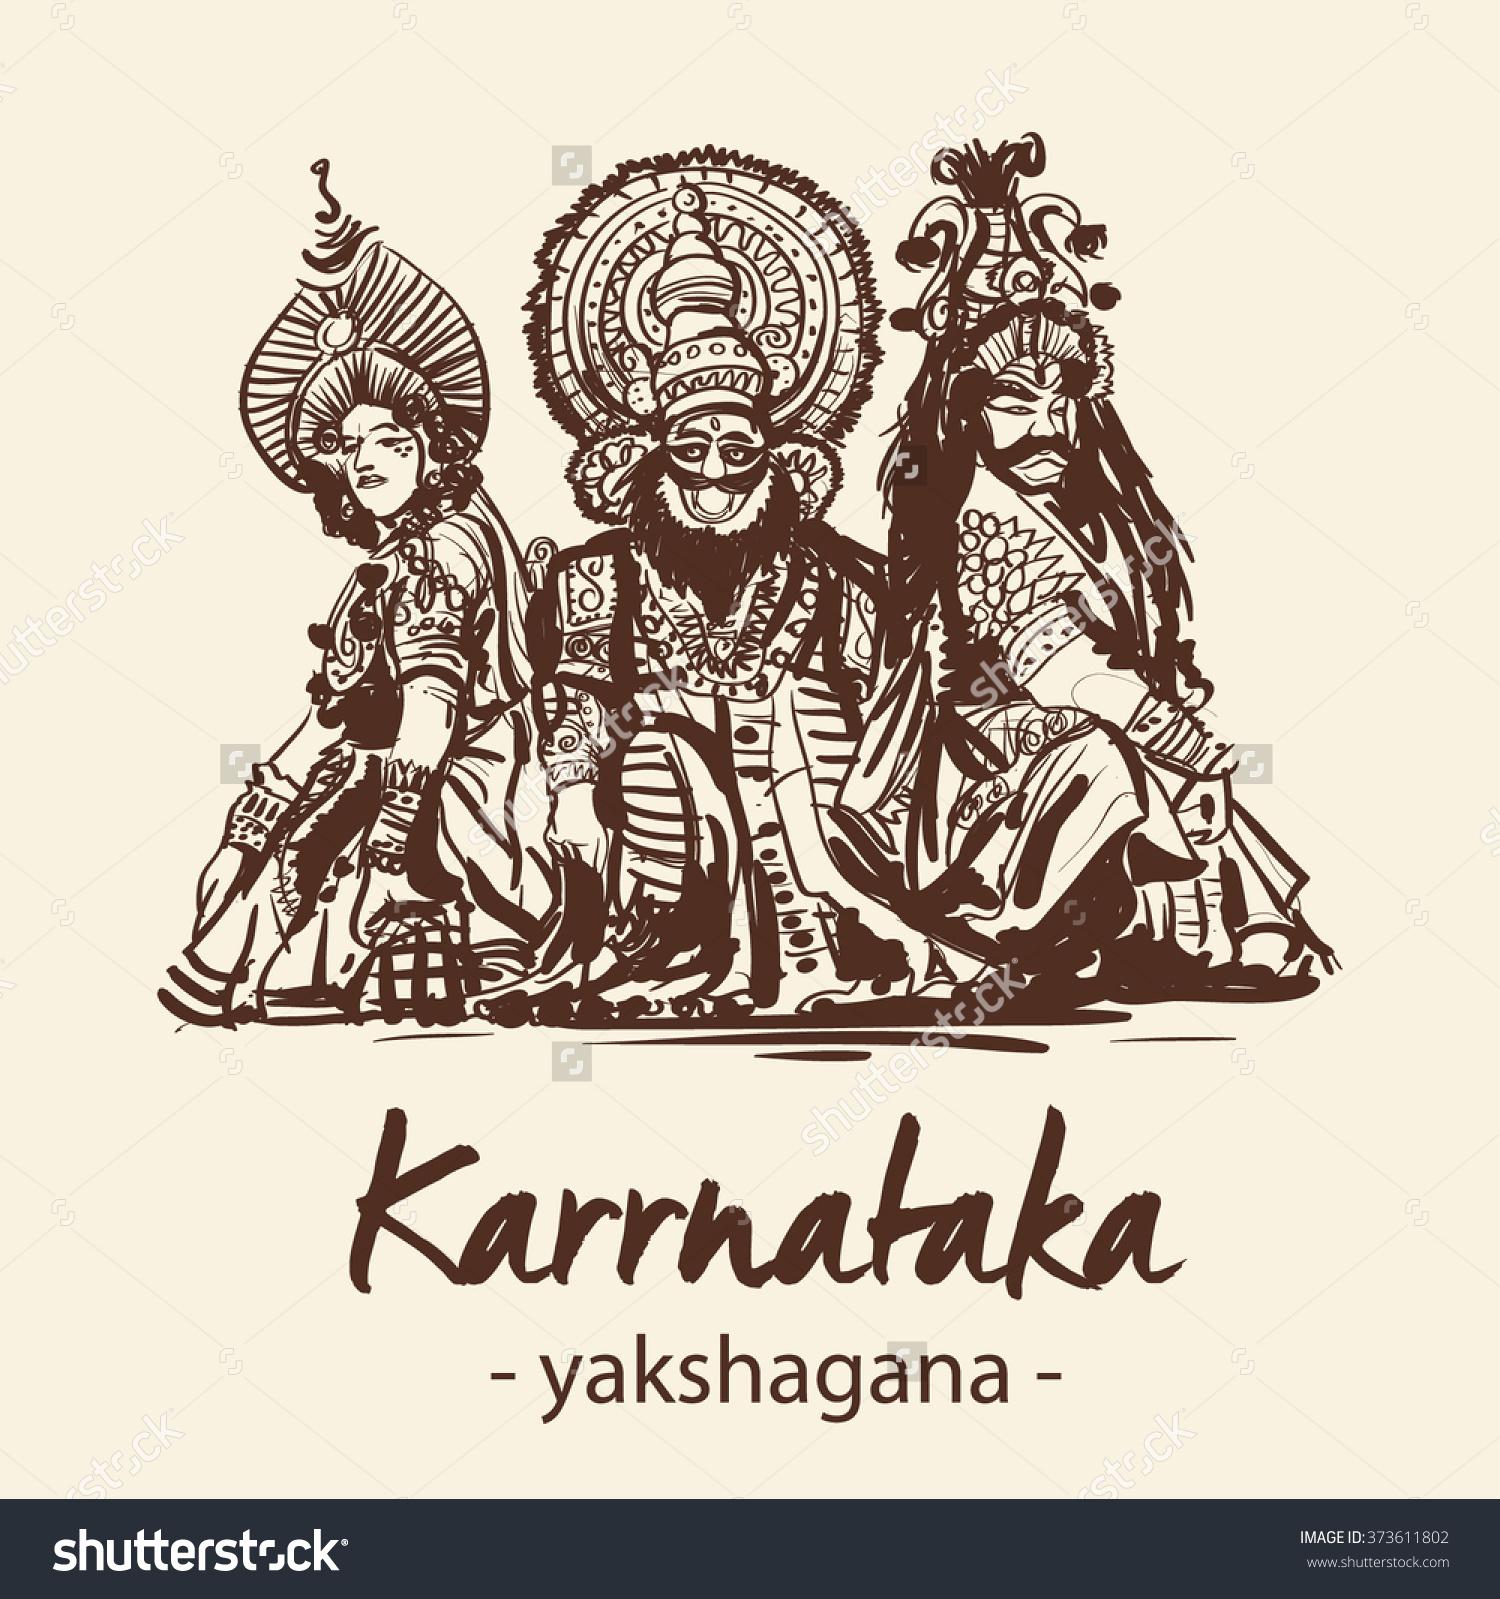 Yakshagana Hampi Karnataka Vector Stock Vector 373611802.